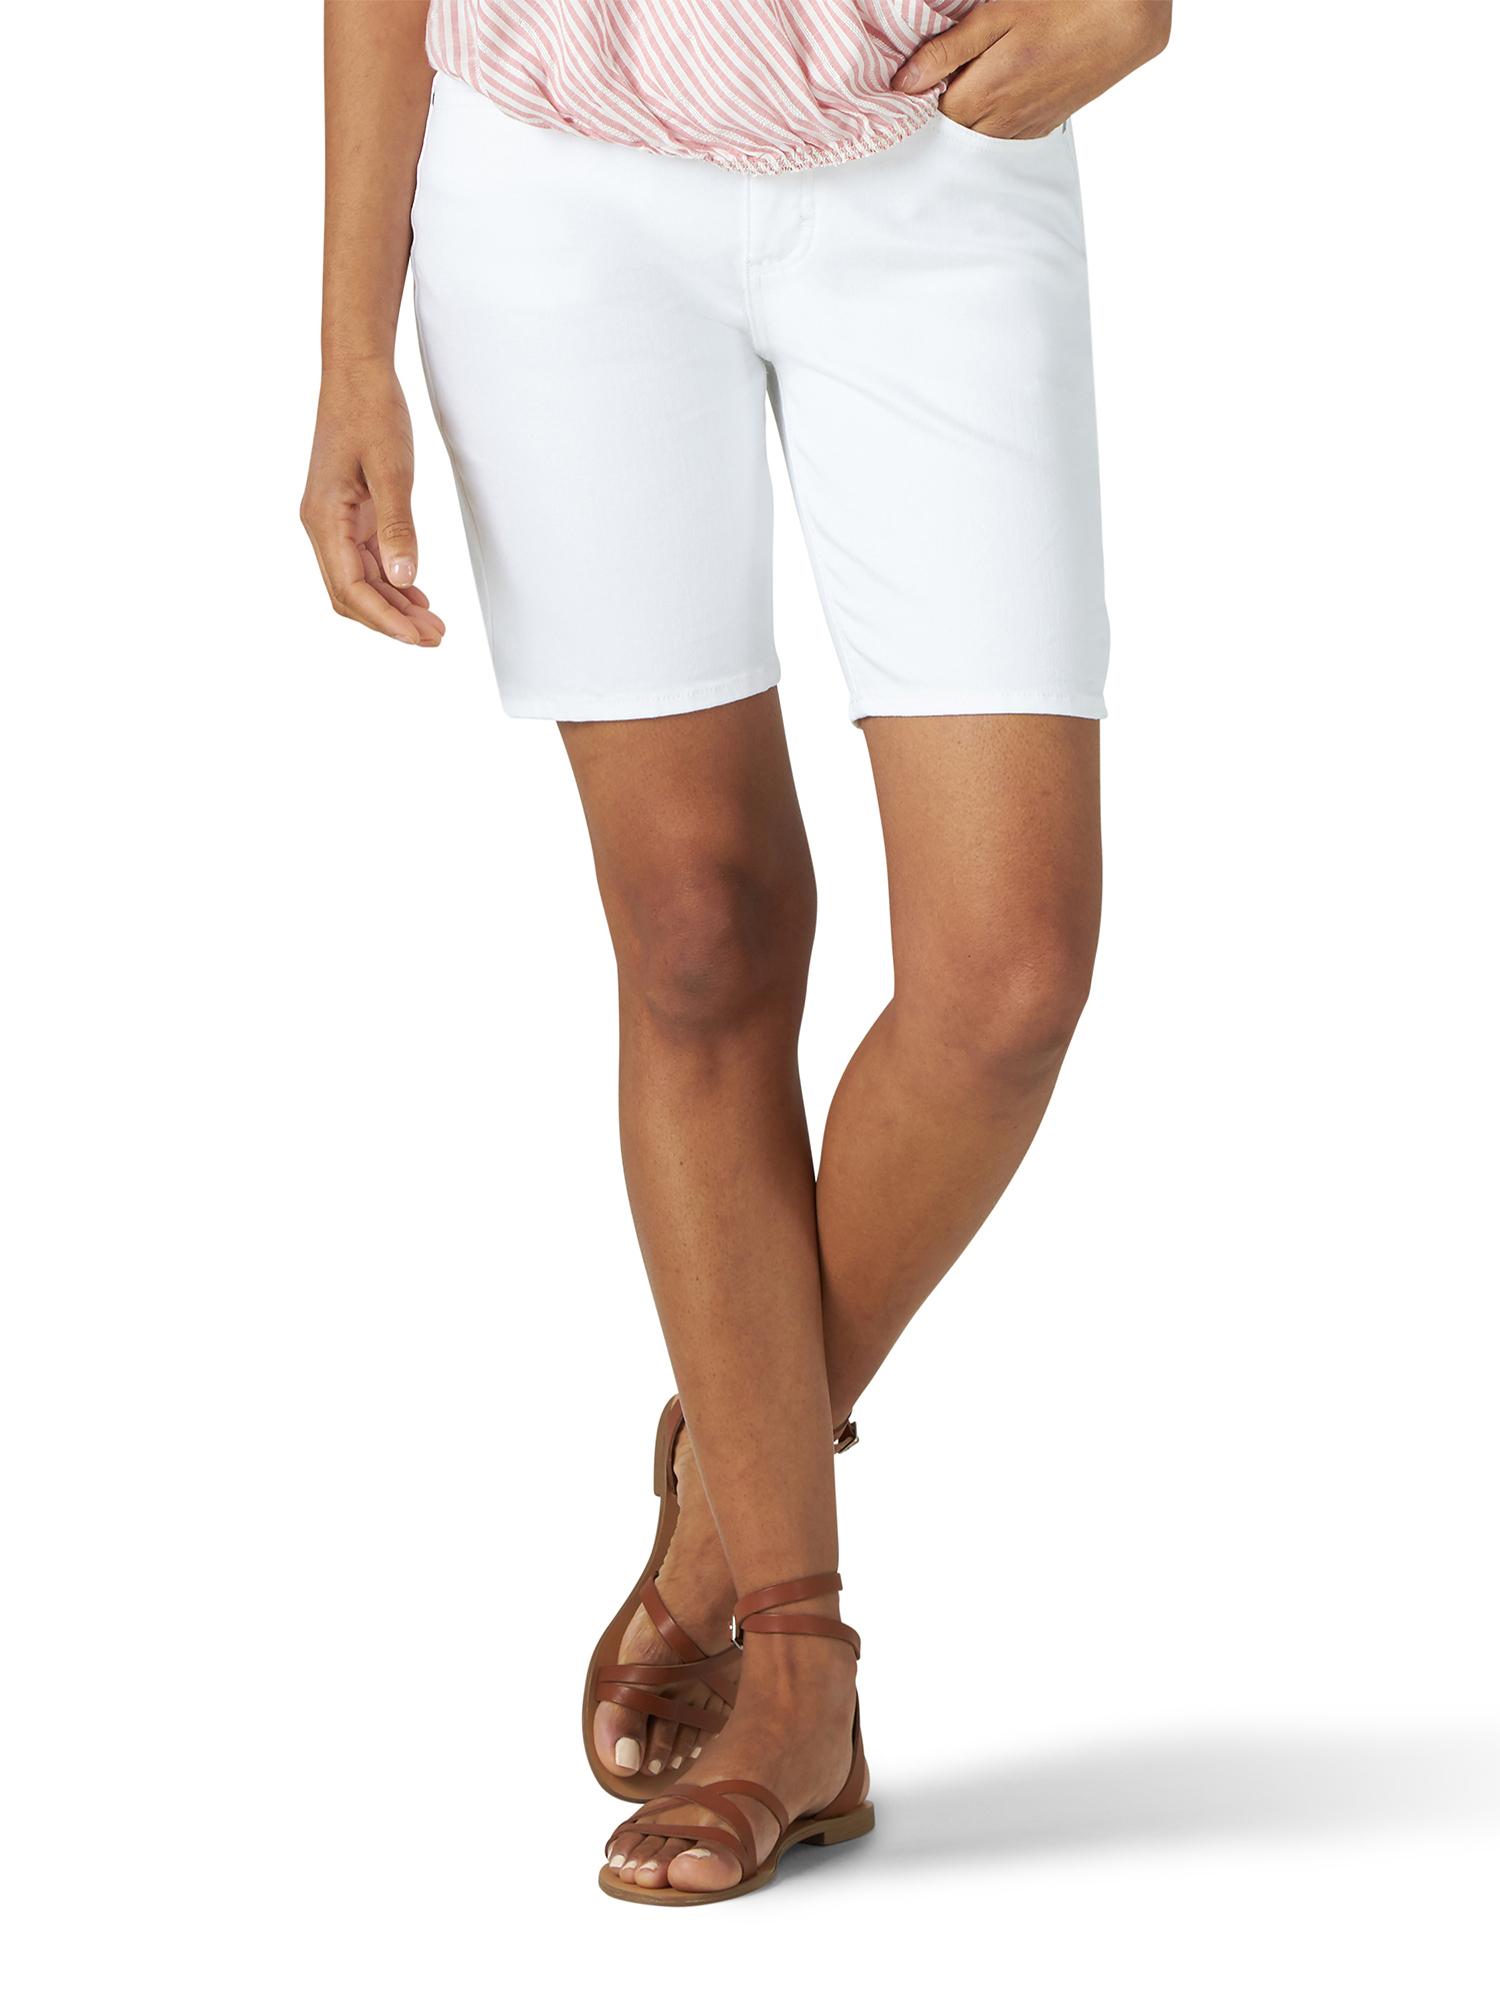 Women/'s Old Navy White Mid-Rise Cuffed Bermuda Shorts 2 6 16 12 8 10 4